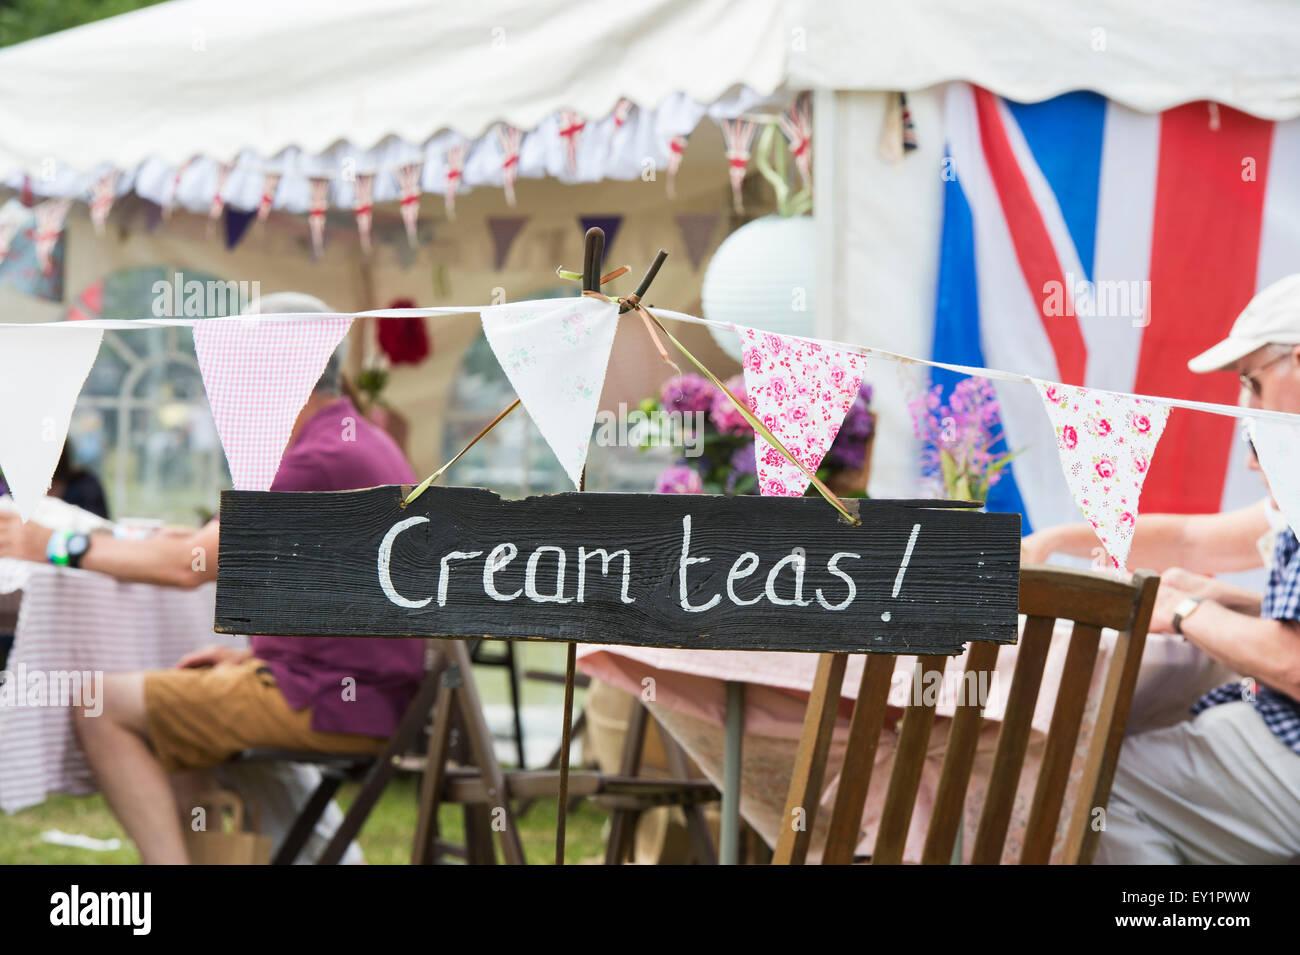 Crema tés de signo en el Thames Festival de Barcos tradicionales, Fawley Meadows, Henley on Thames, Inglaterra Imagen De Stock